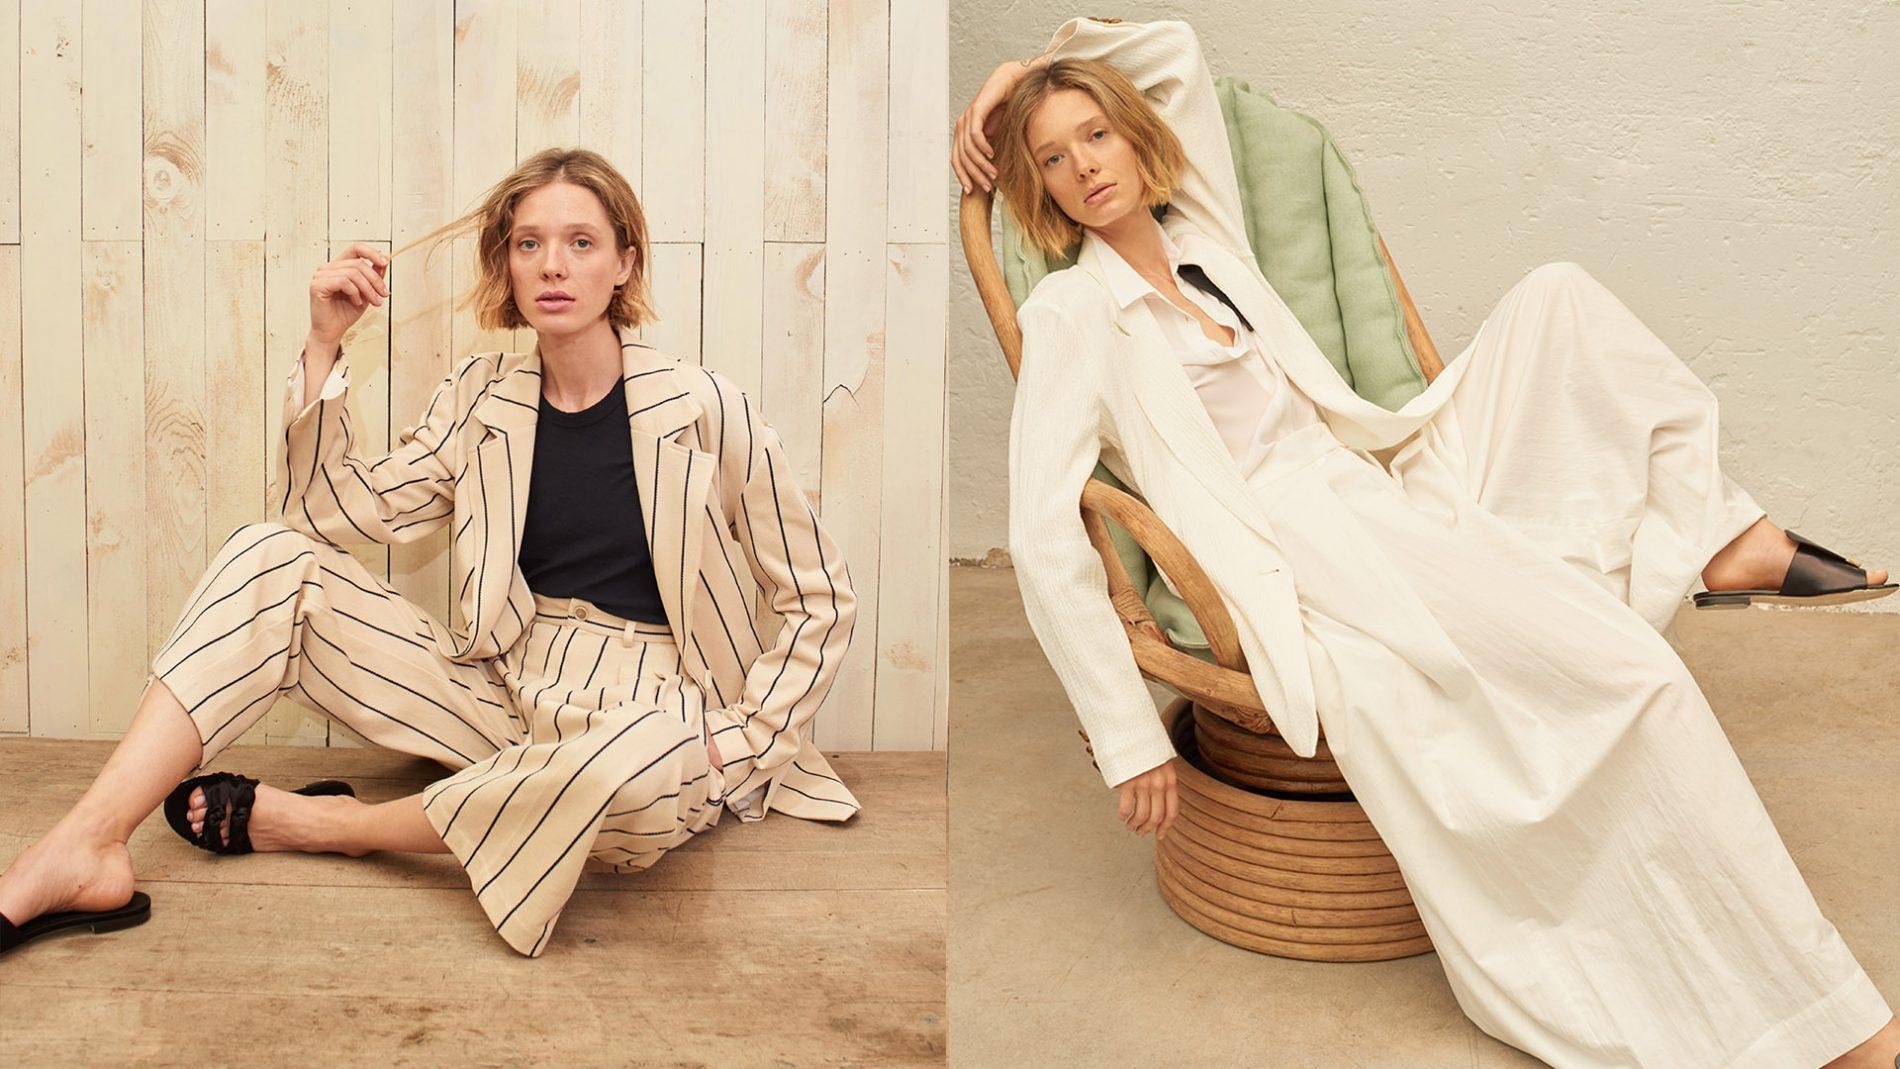 El Corte Inglés Ready-To-Wear Designer Shoes Victoria Beckham Tabitha Simmons Sergio Rossi